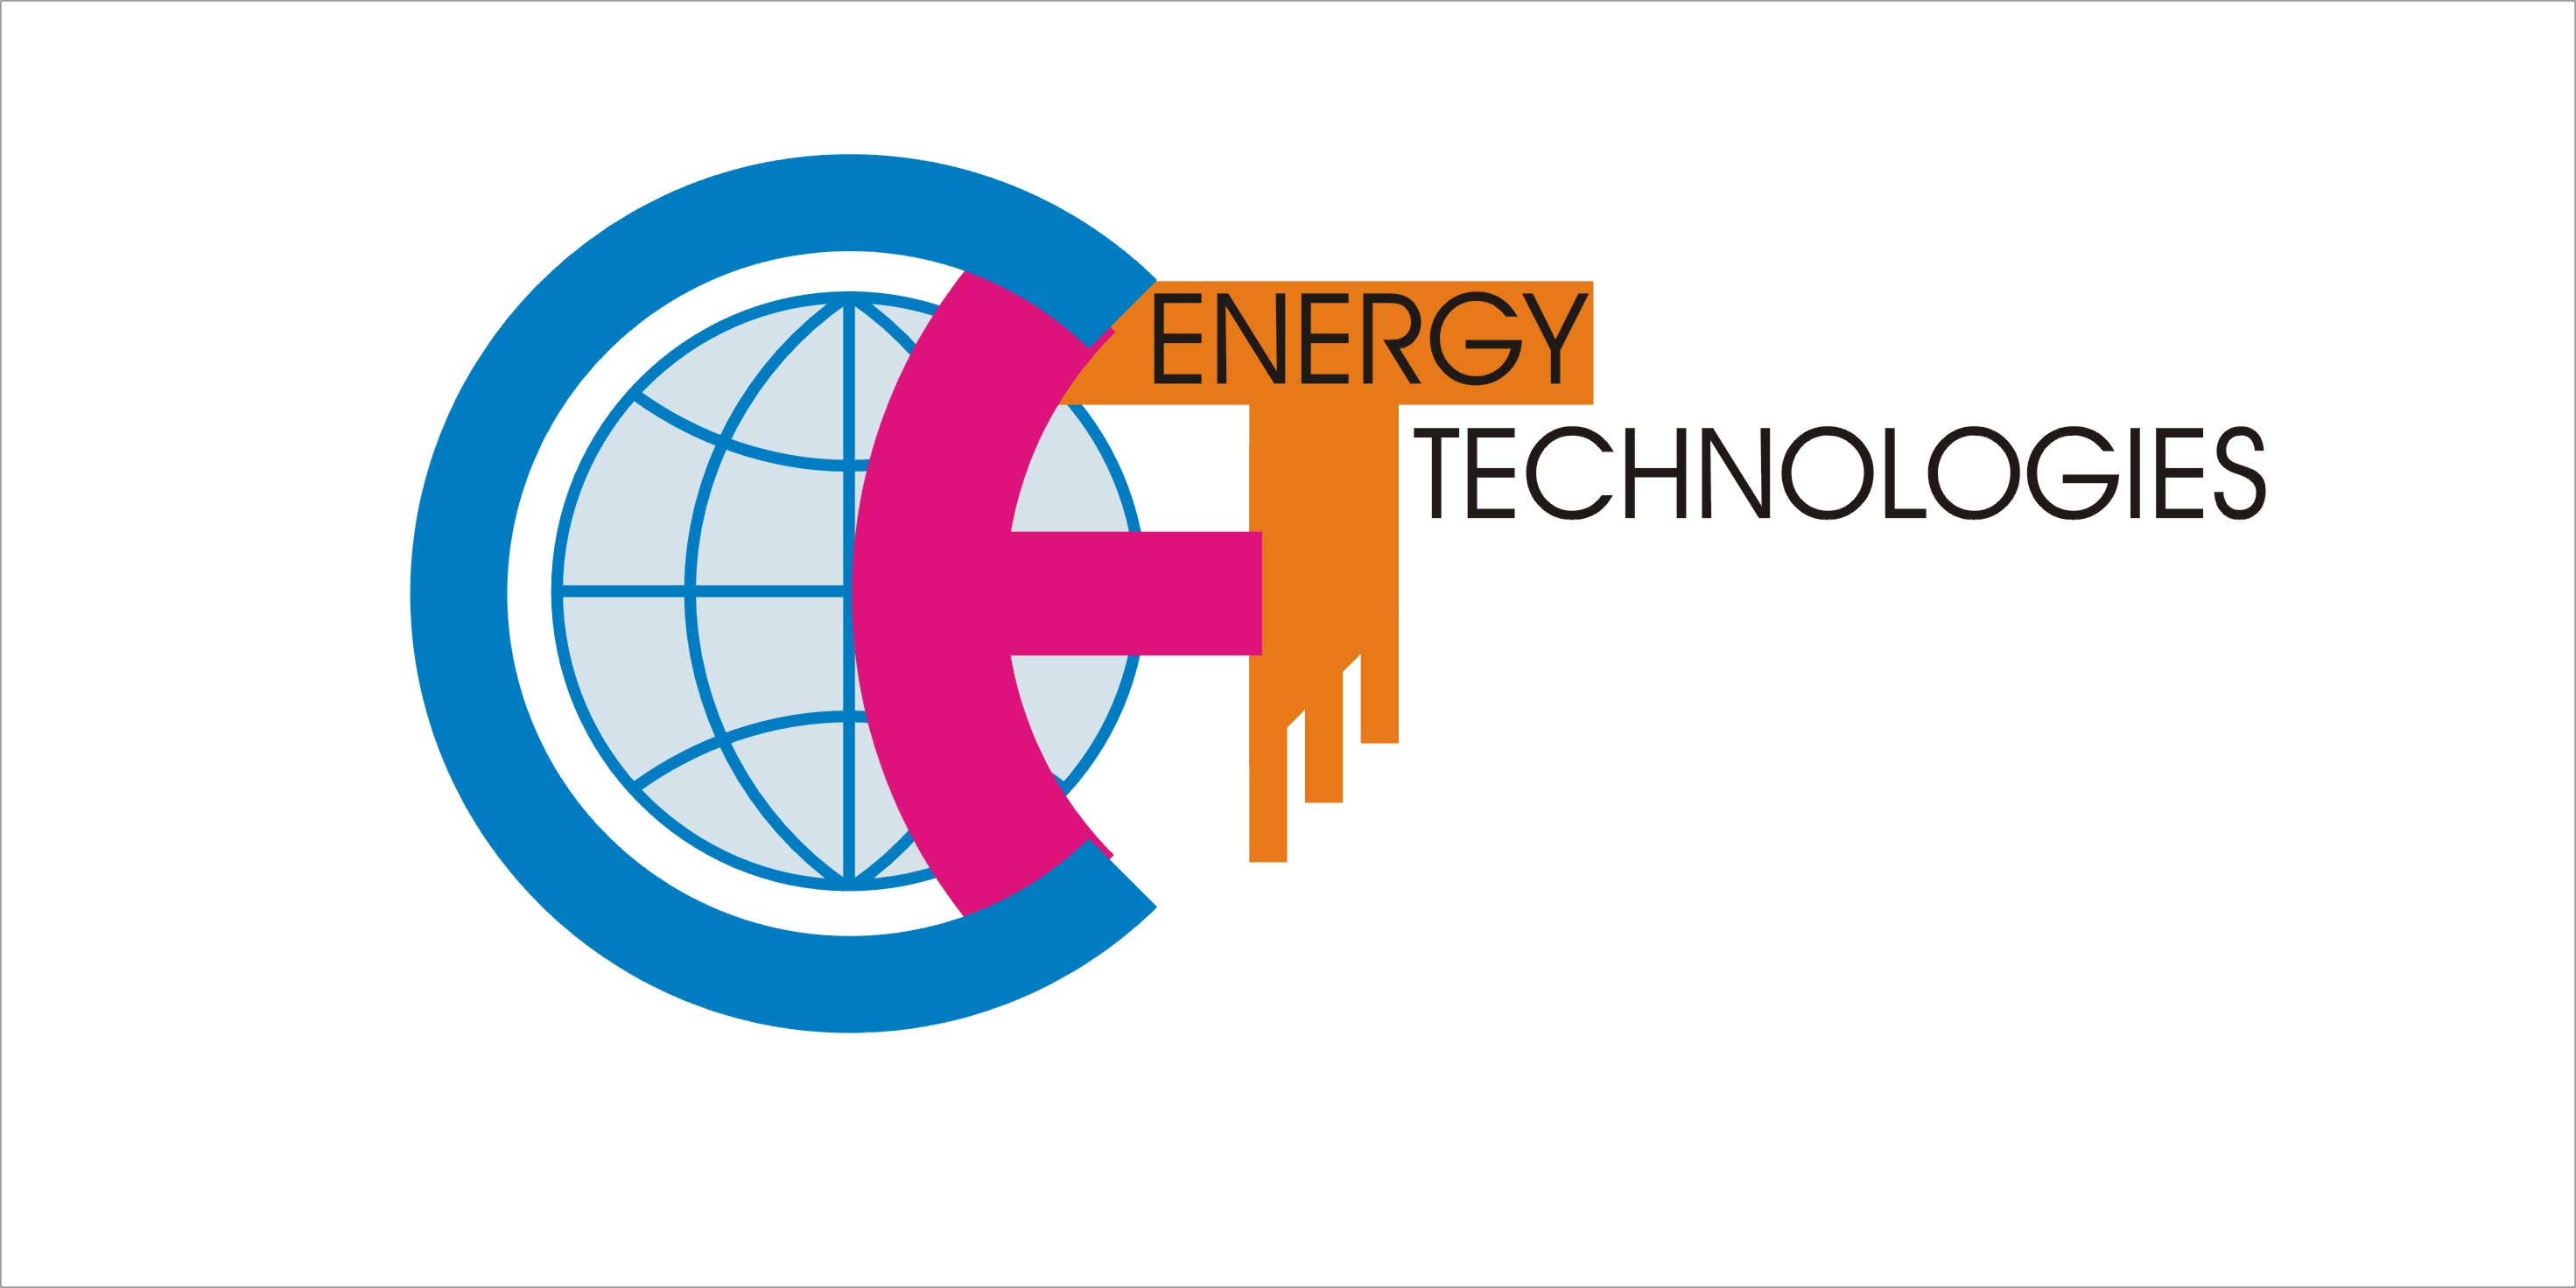 Срочно! Дизайн логотипа ООО «СЭТ» фото f_2465d54154b40347.jpg